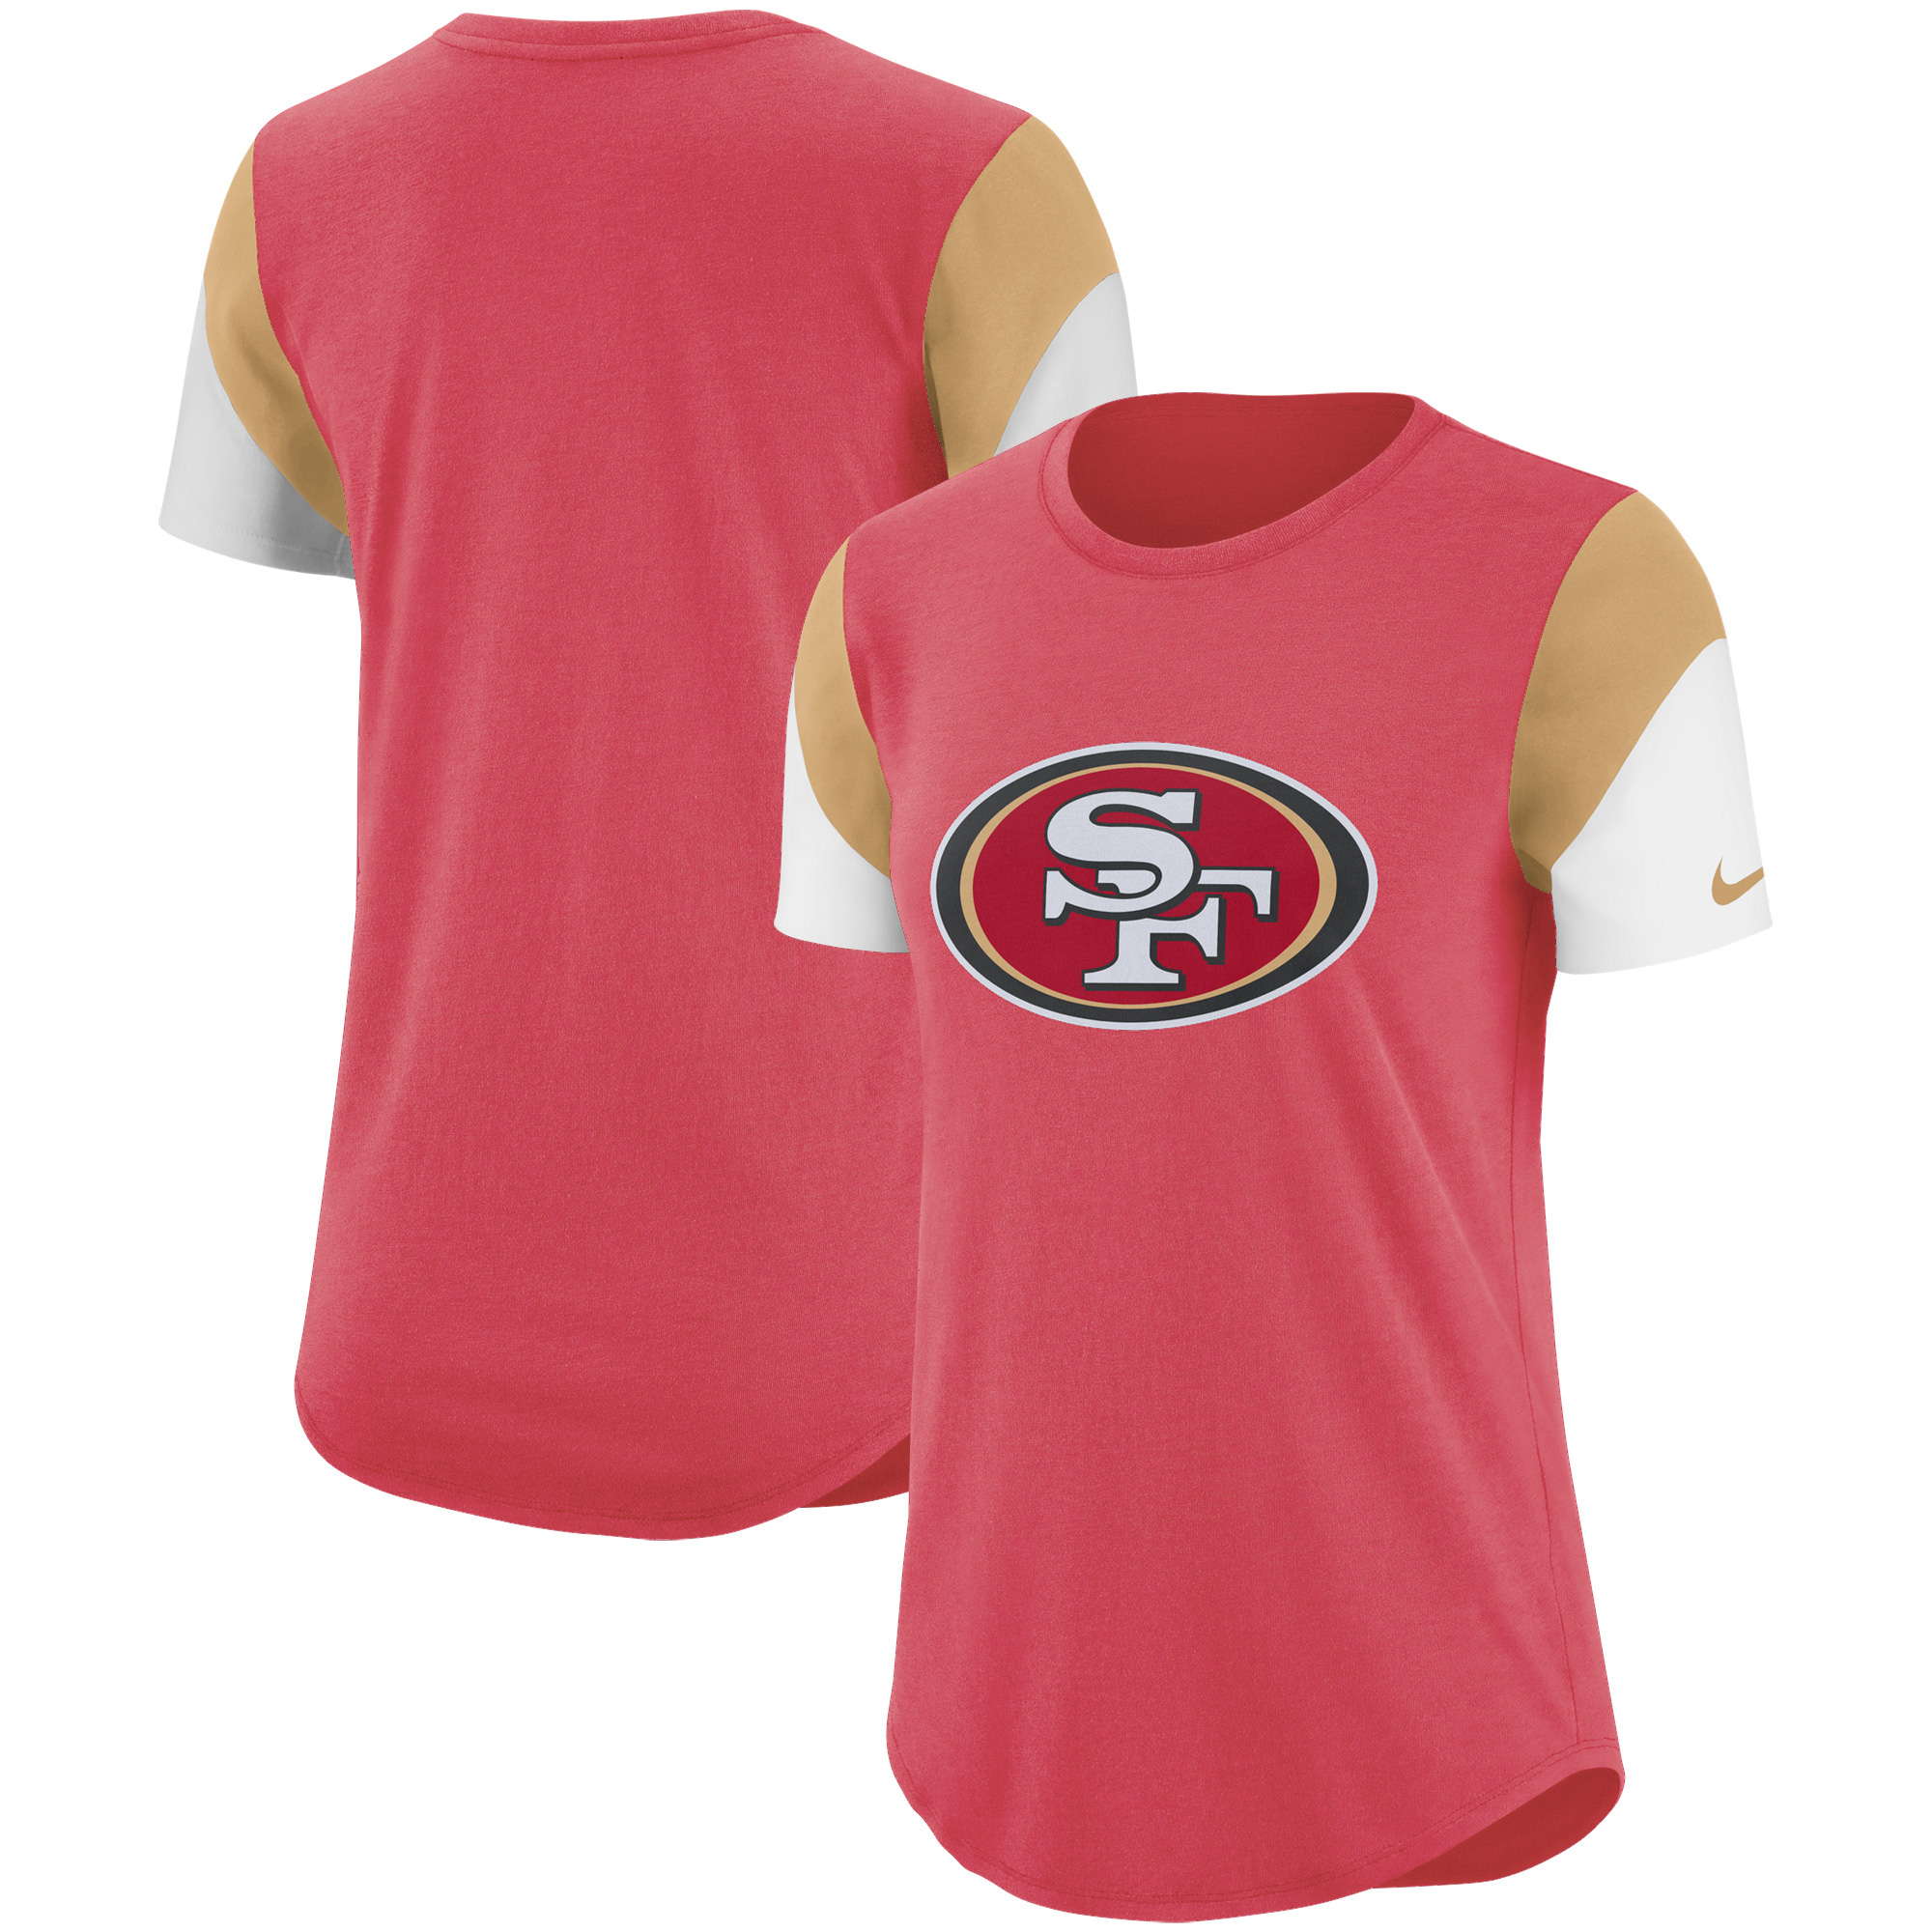 San Francisco 49ers Nike Women's Tri-Blend Team Fan T-Shirt - Scarlet/Gold